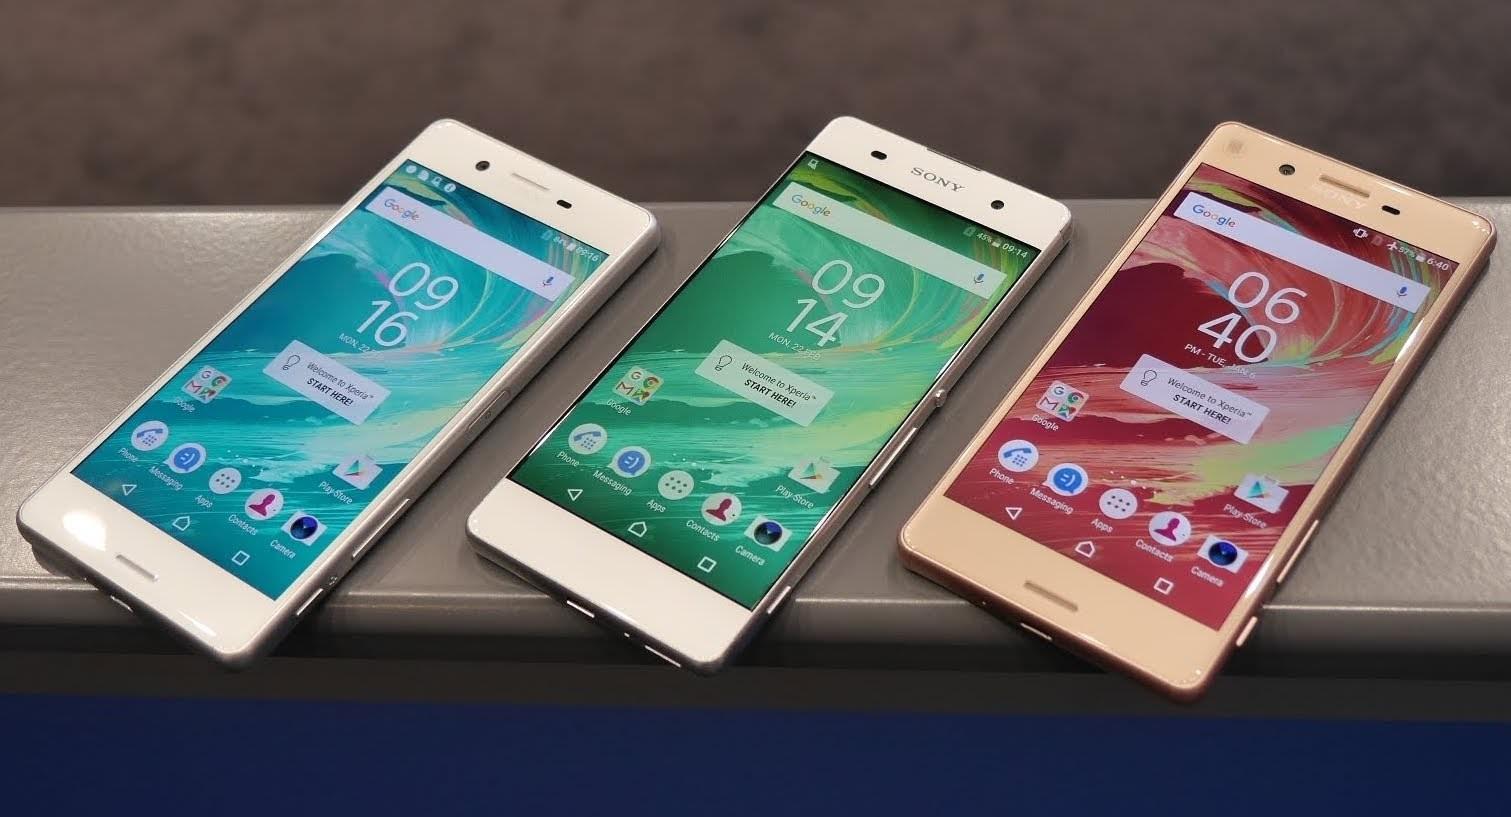 Новый смартфон Сони Xperia Xбудет представлен суменьшенными рамками